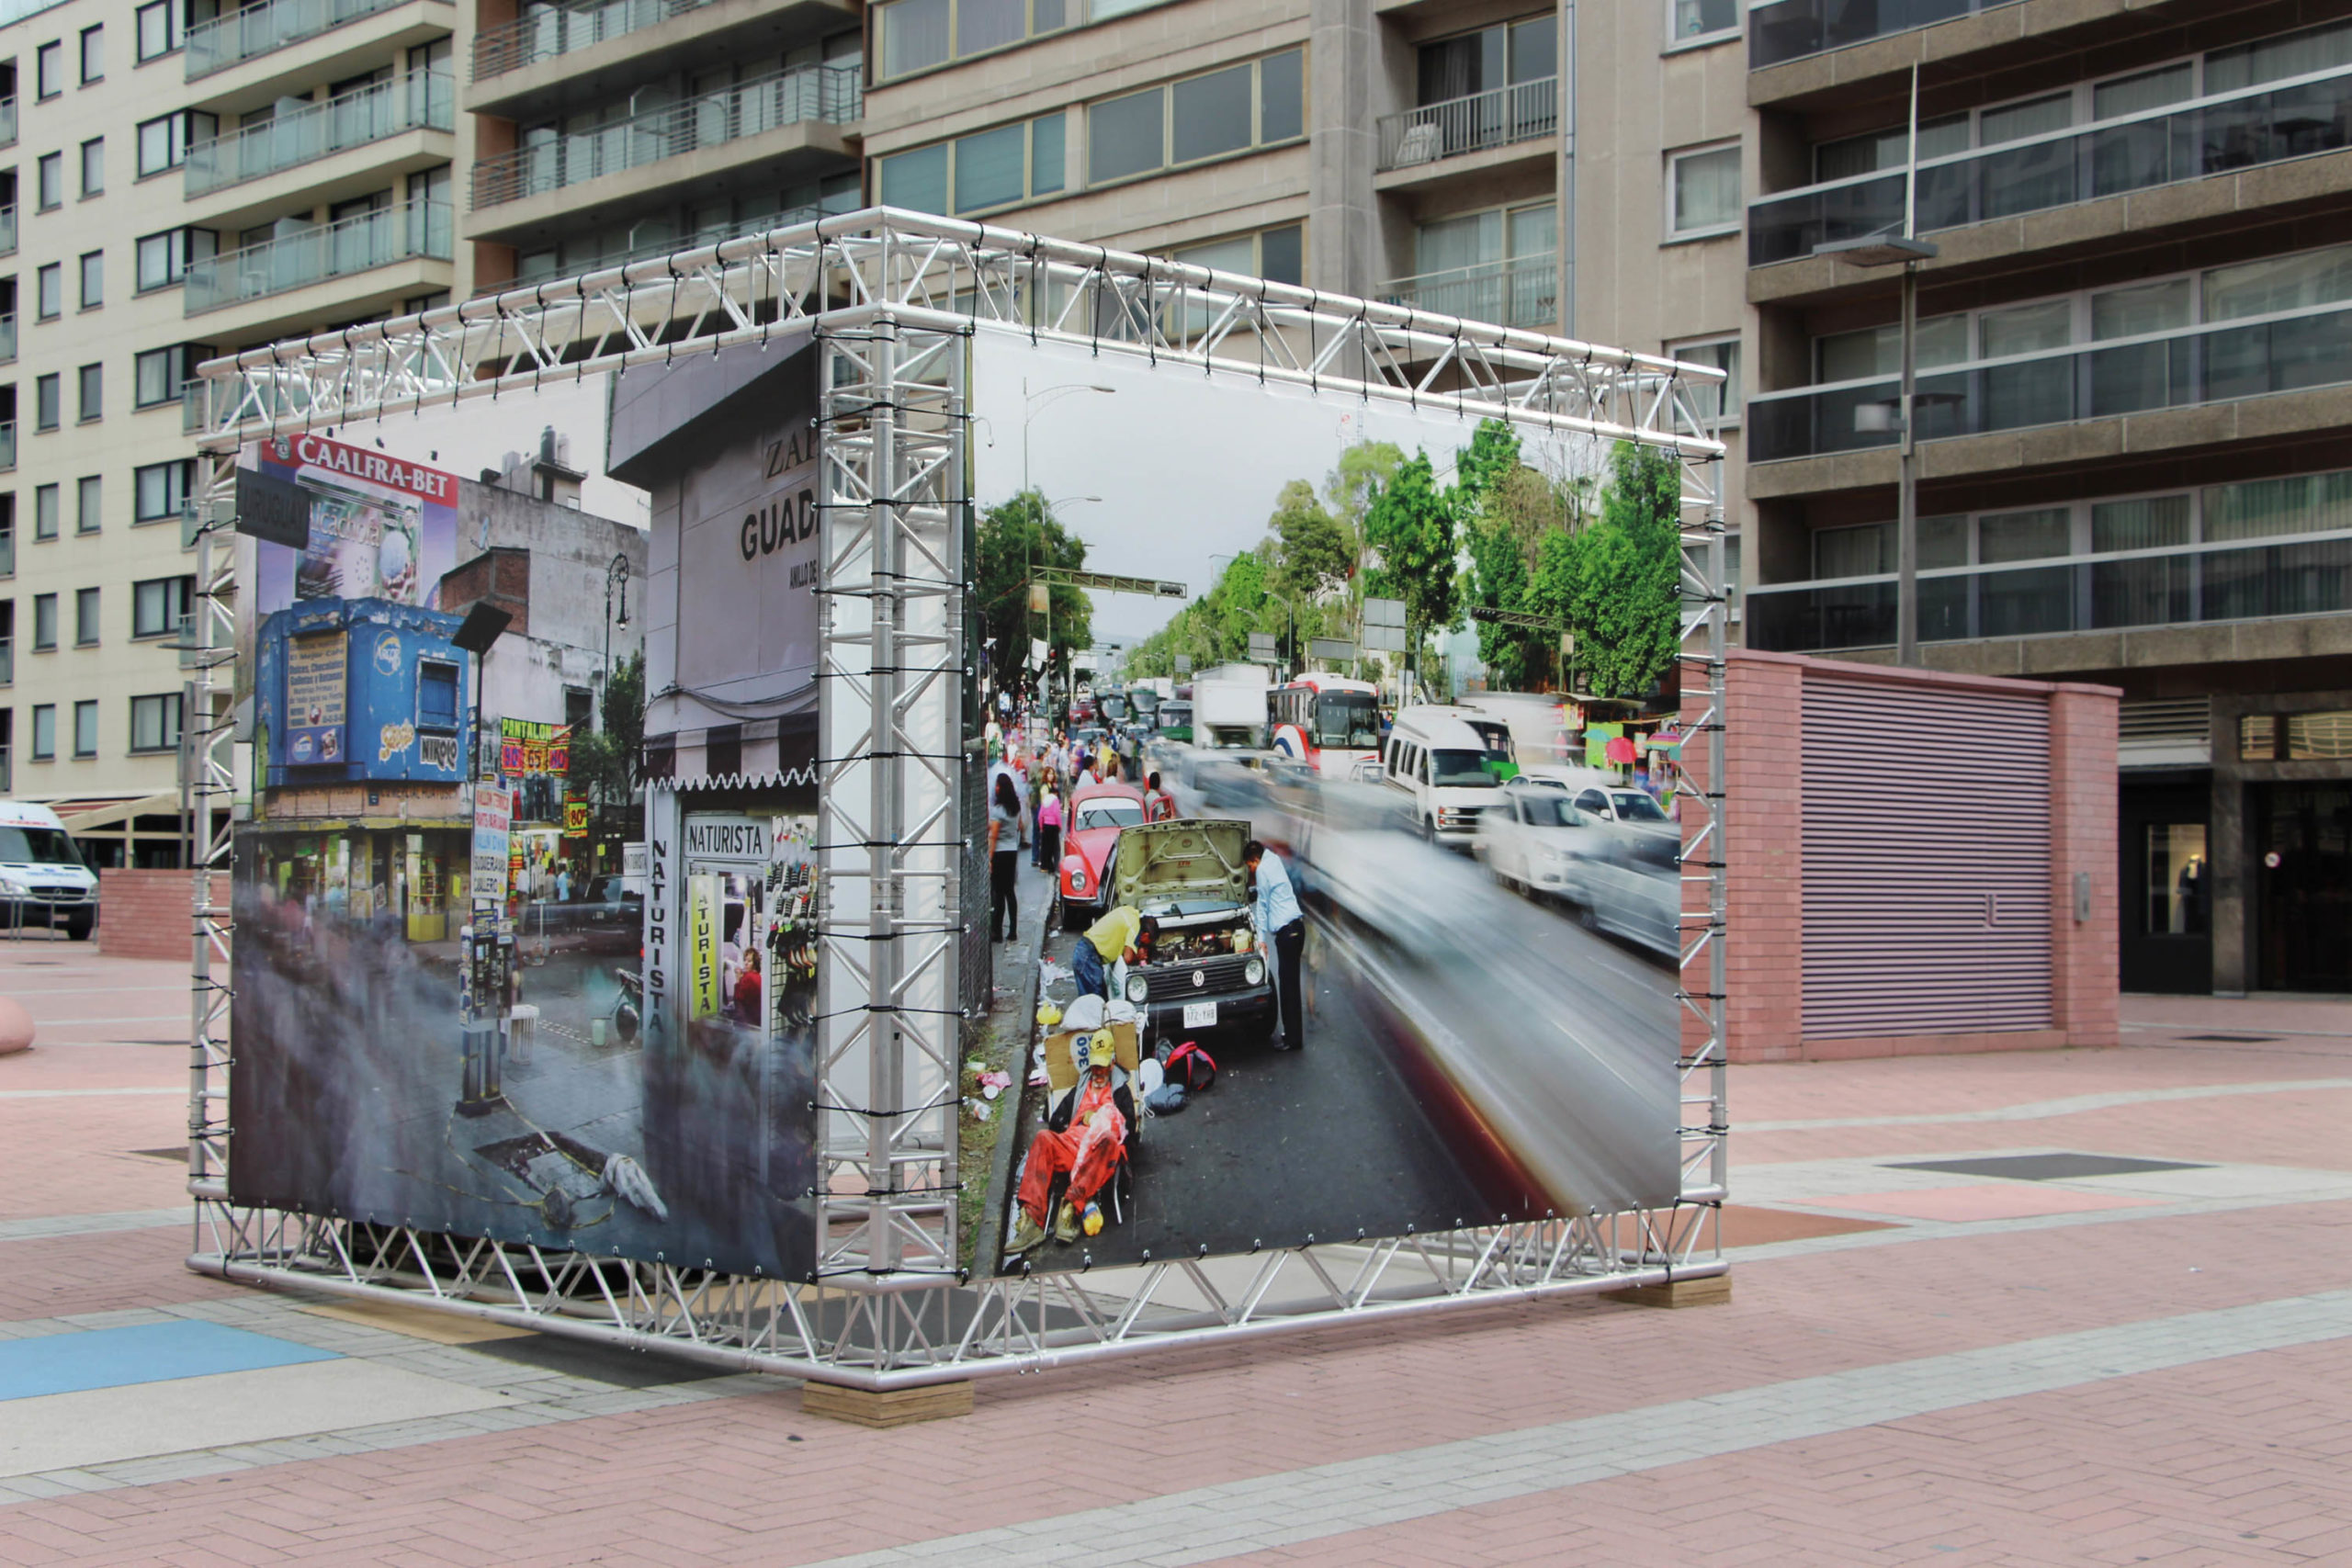 Biennial of Photography, Knokke-Heist, Belgium